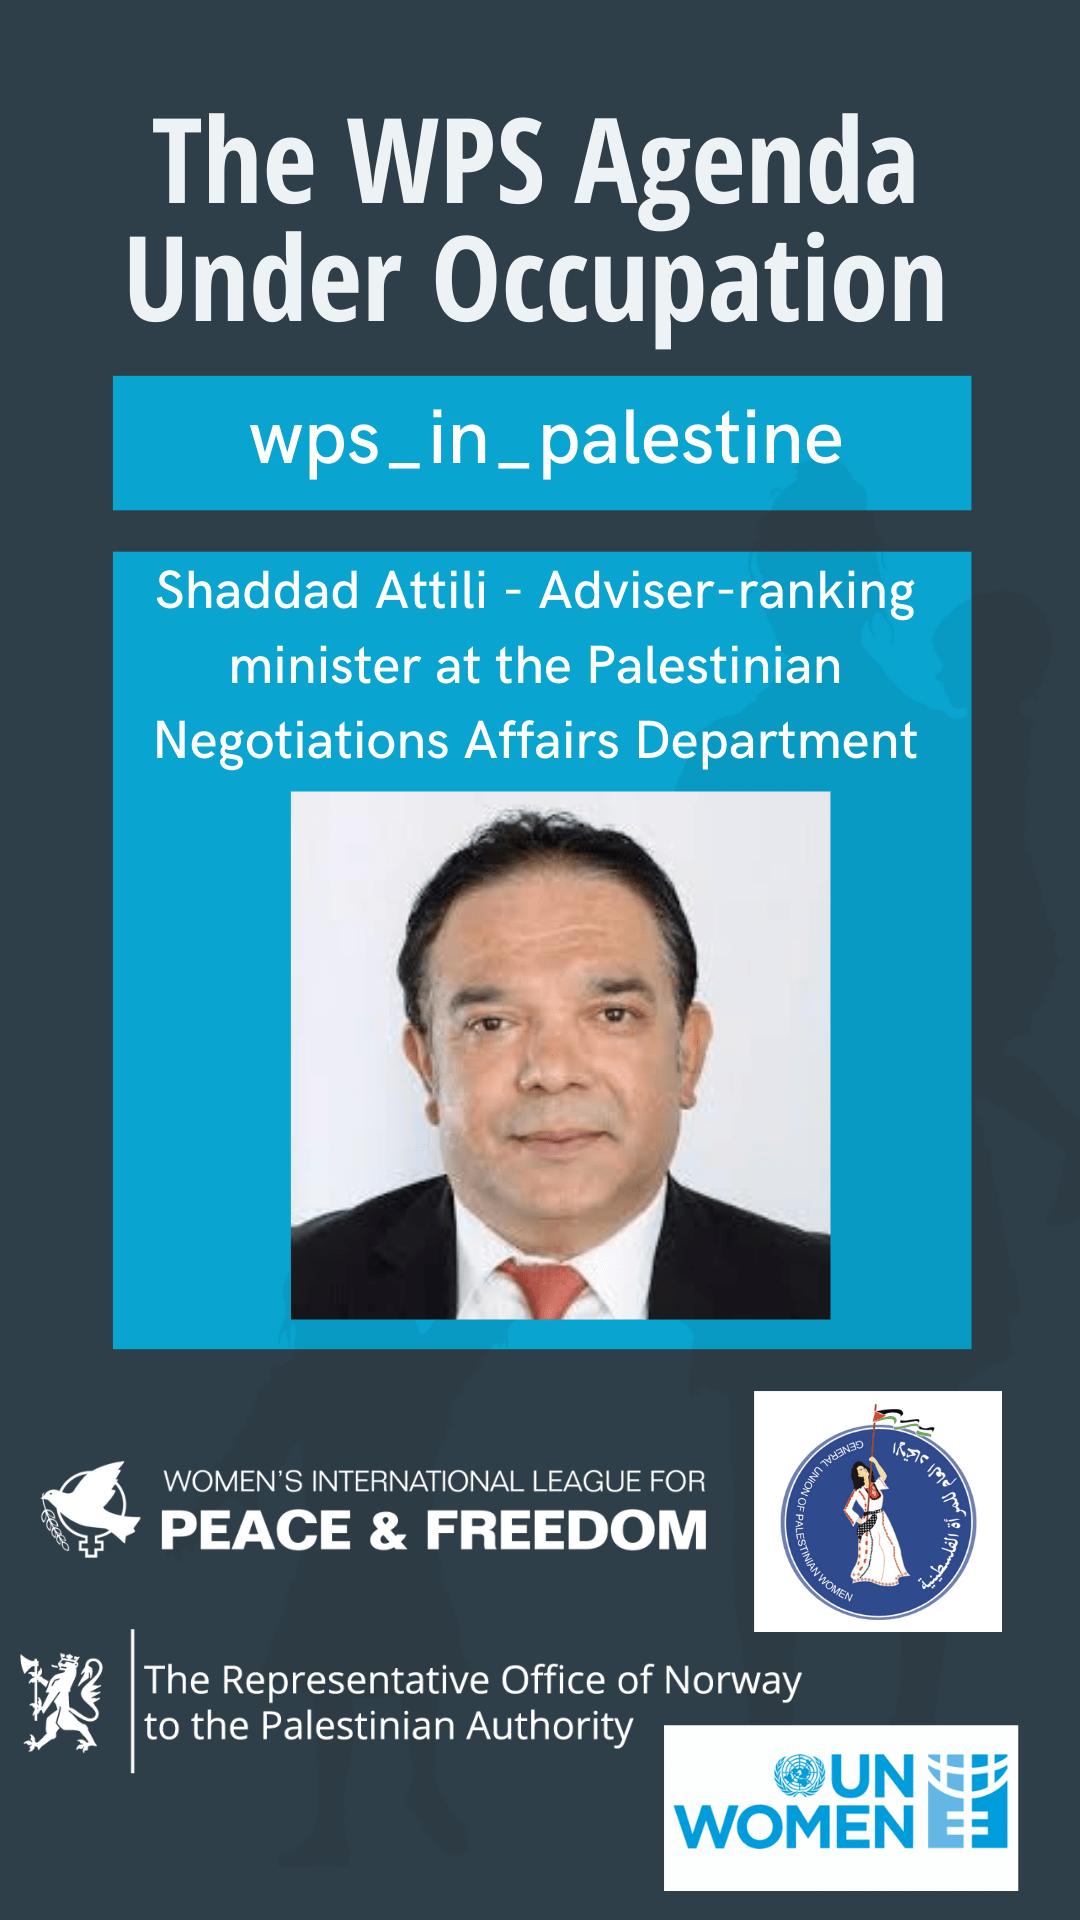 Shaddad Atili, adviser-ranking minister at the Palestinian Negotiations Affairs Department